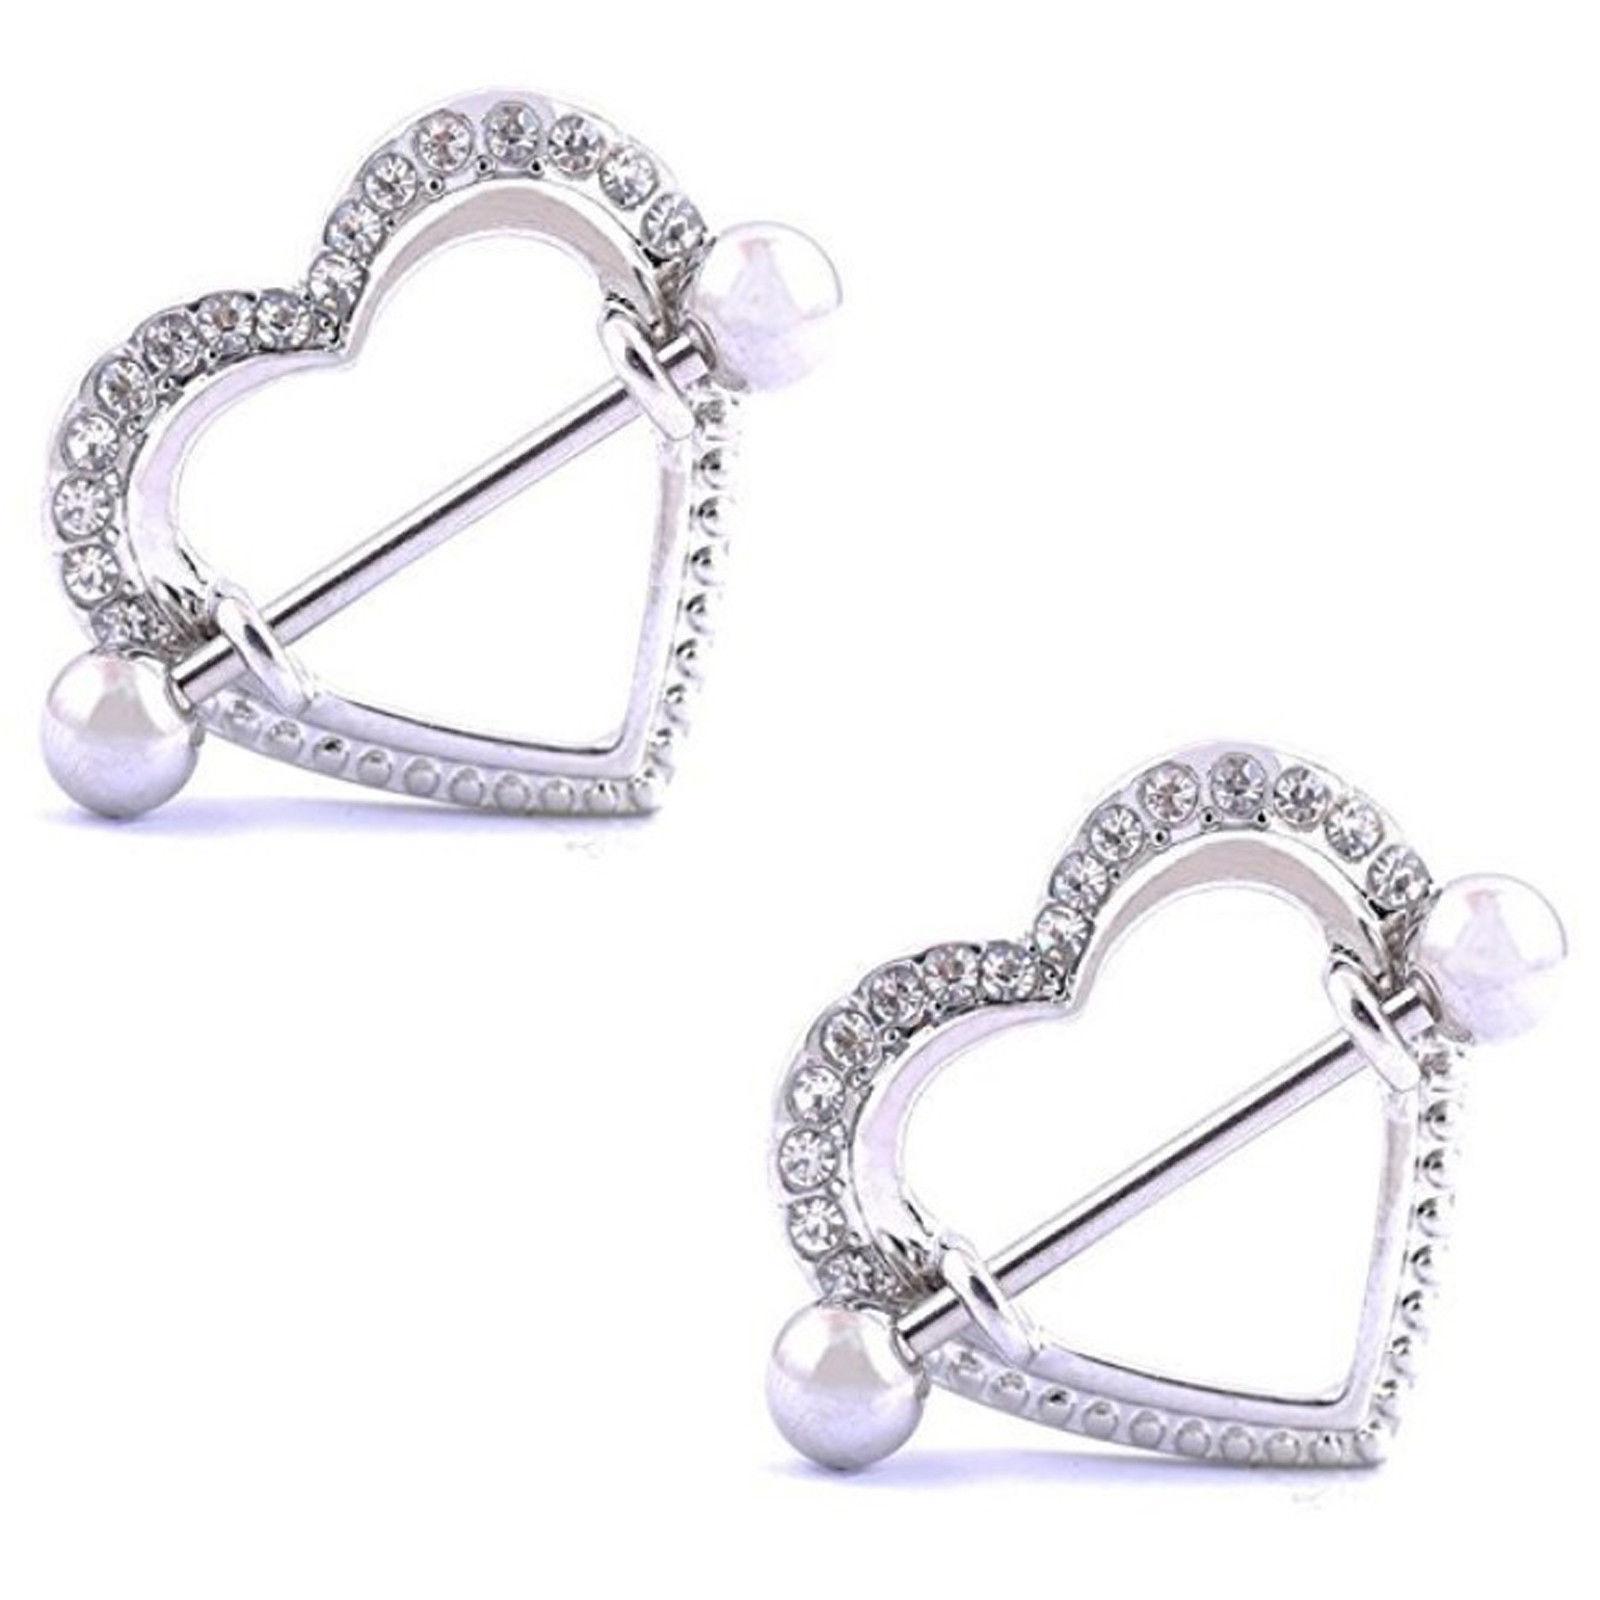 Heart Nipple Rings Jewelry 67d07aef8957